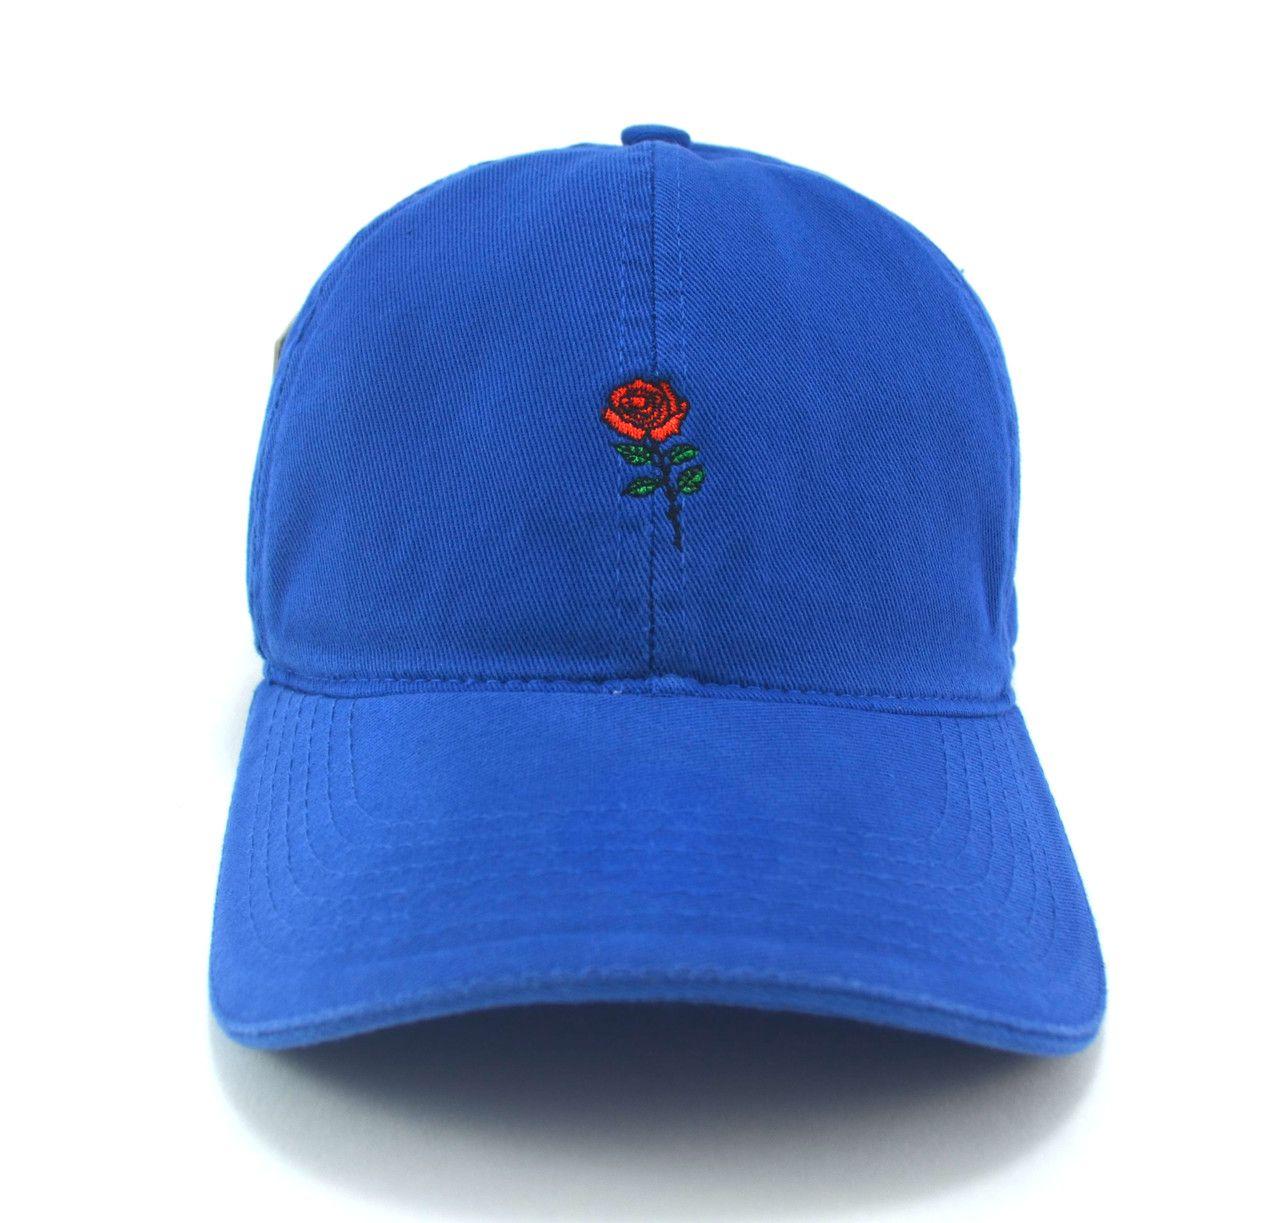 Boné Flor Masculino Feminino Azul Aba Curva - Fita e Fivela